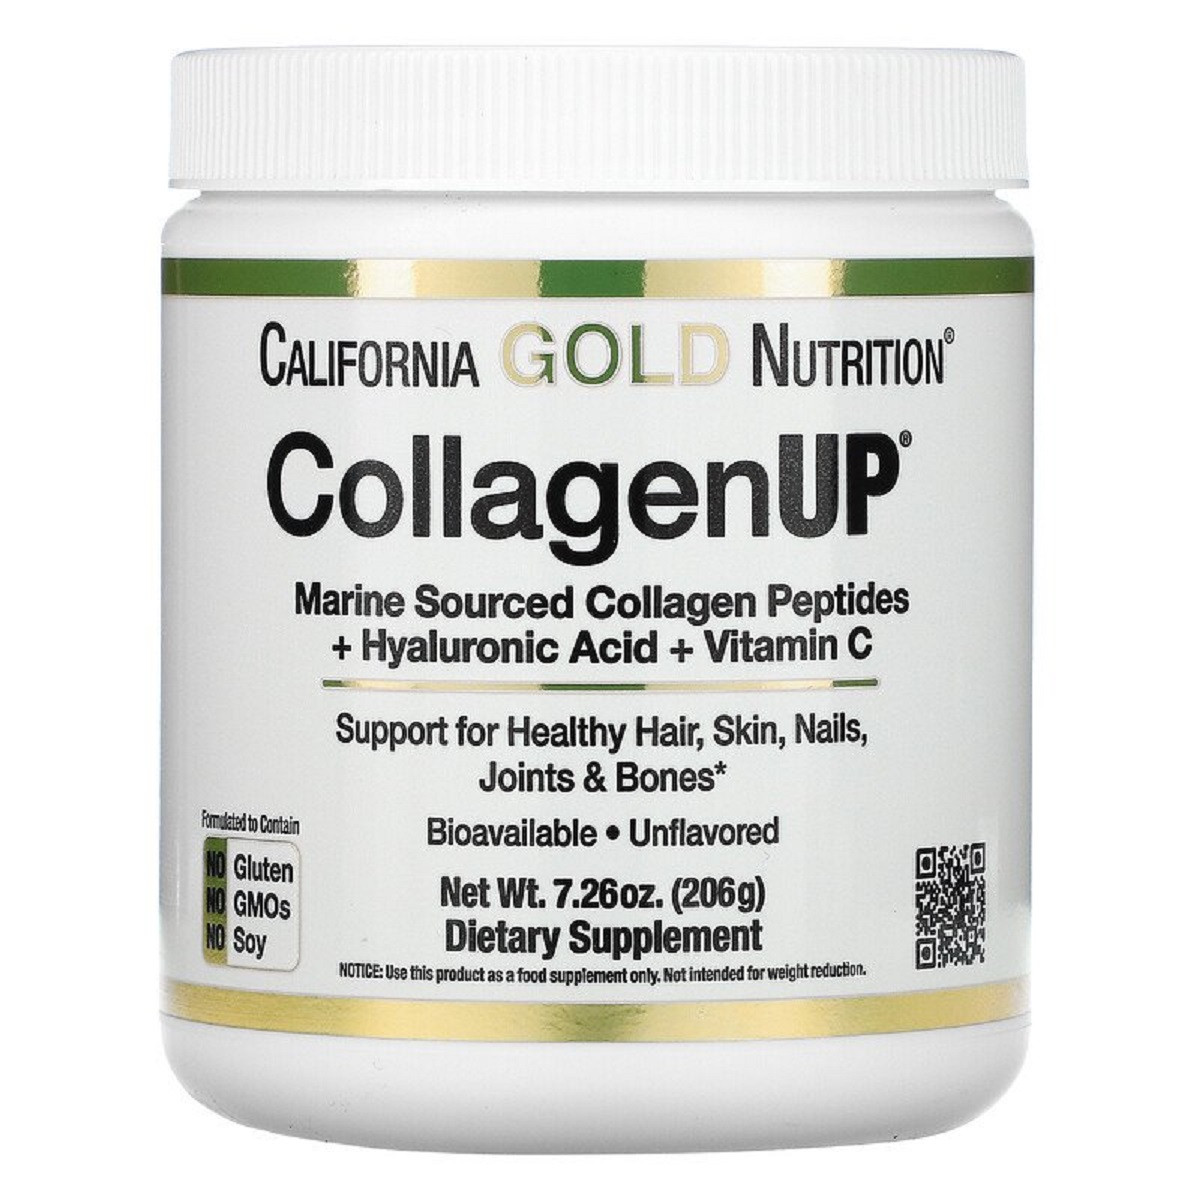 Коллаген Пептиды UP без ароматизаторов, Collagen, California Gold Nutrition, 7,26 унц. (206 г)